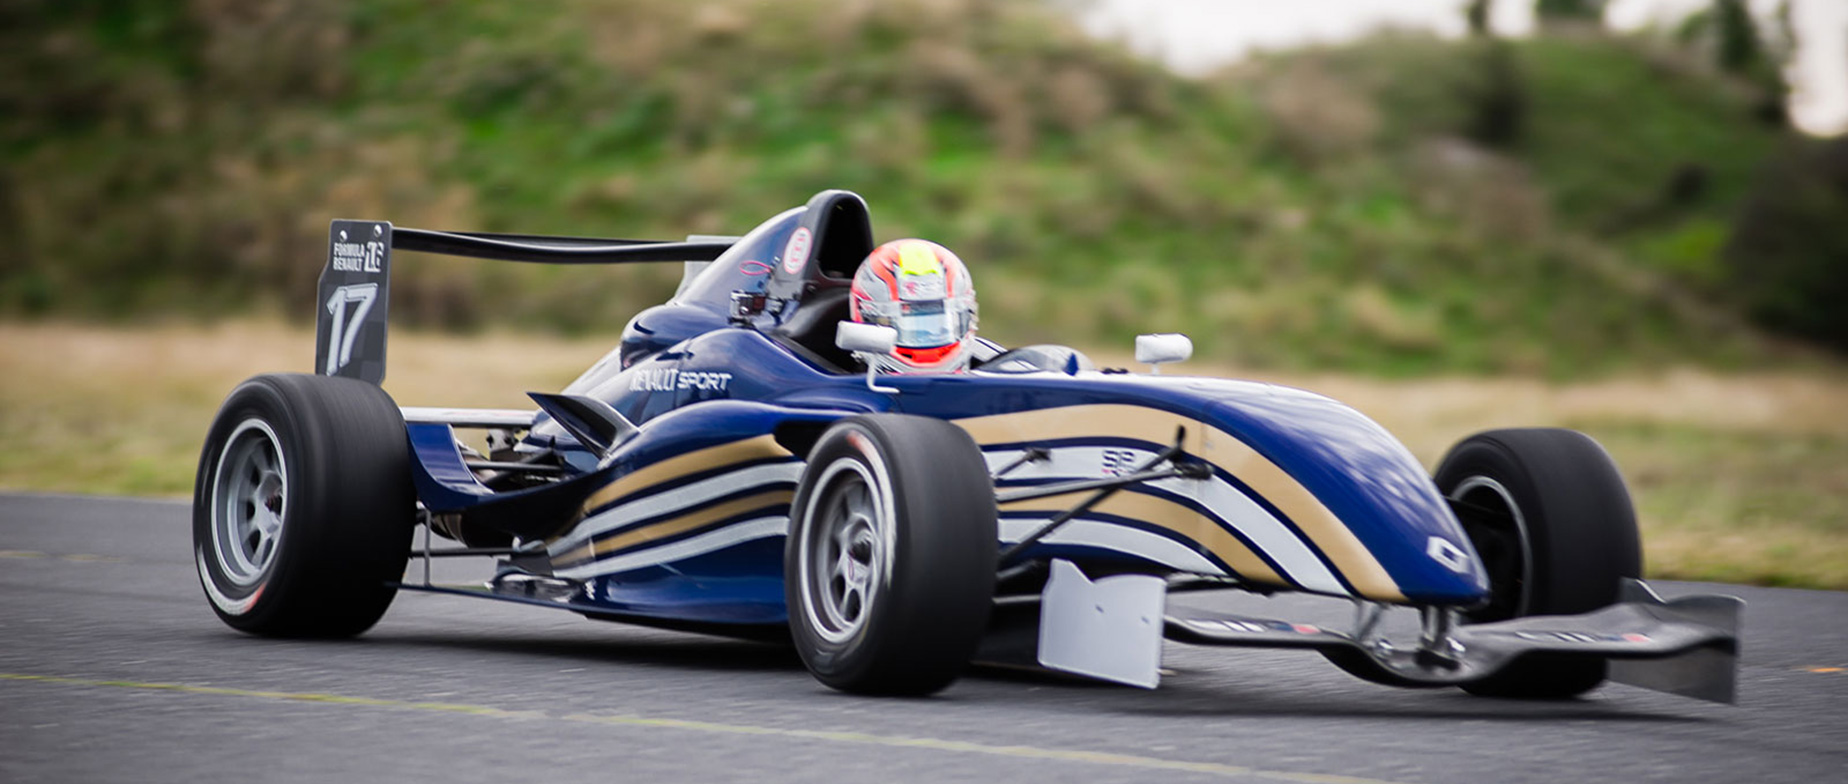 Forma Renault élményvezetés DRX ringen